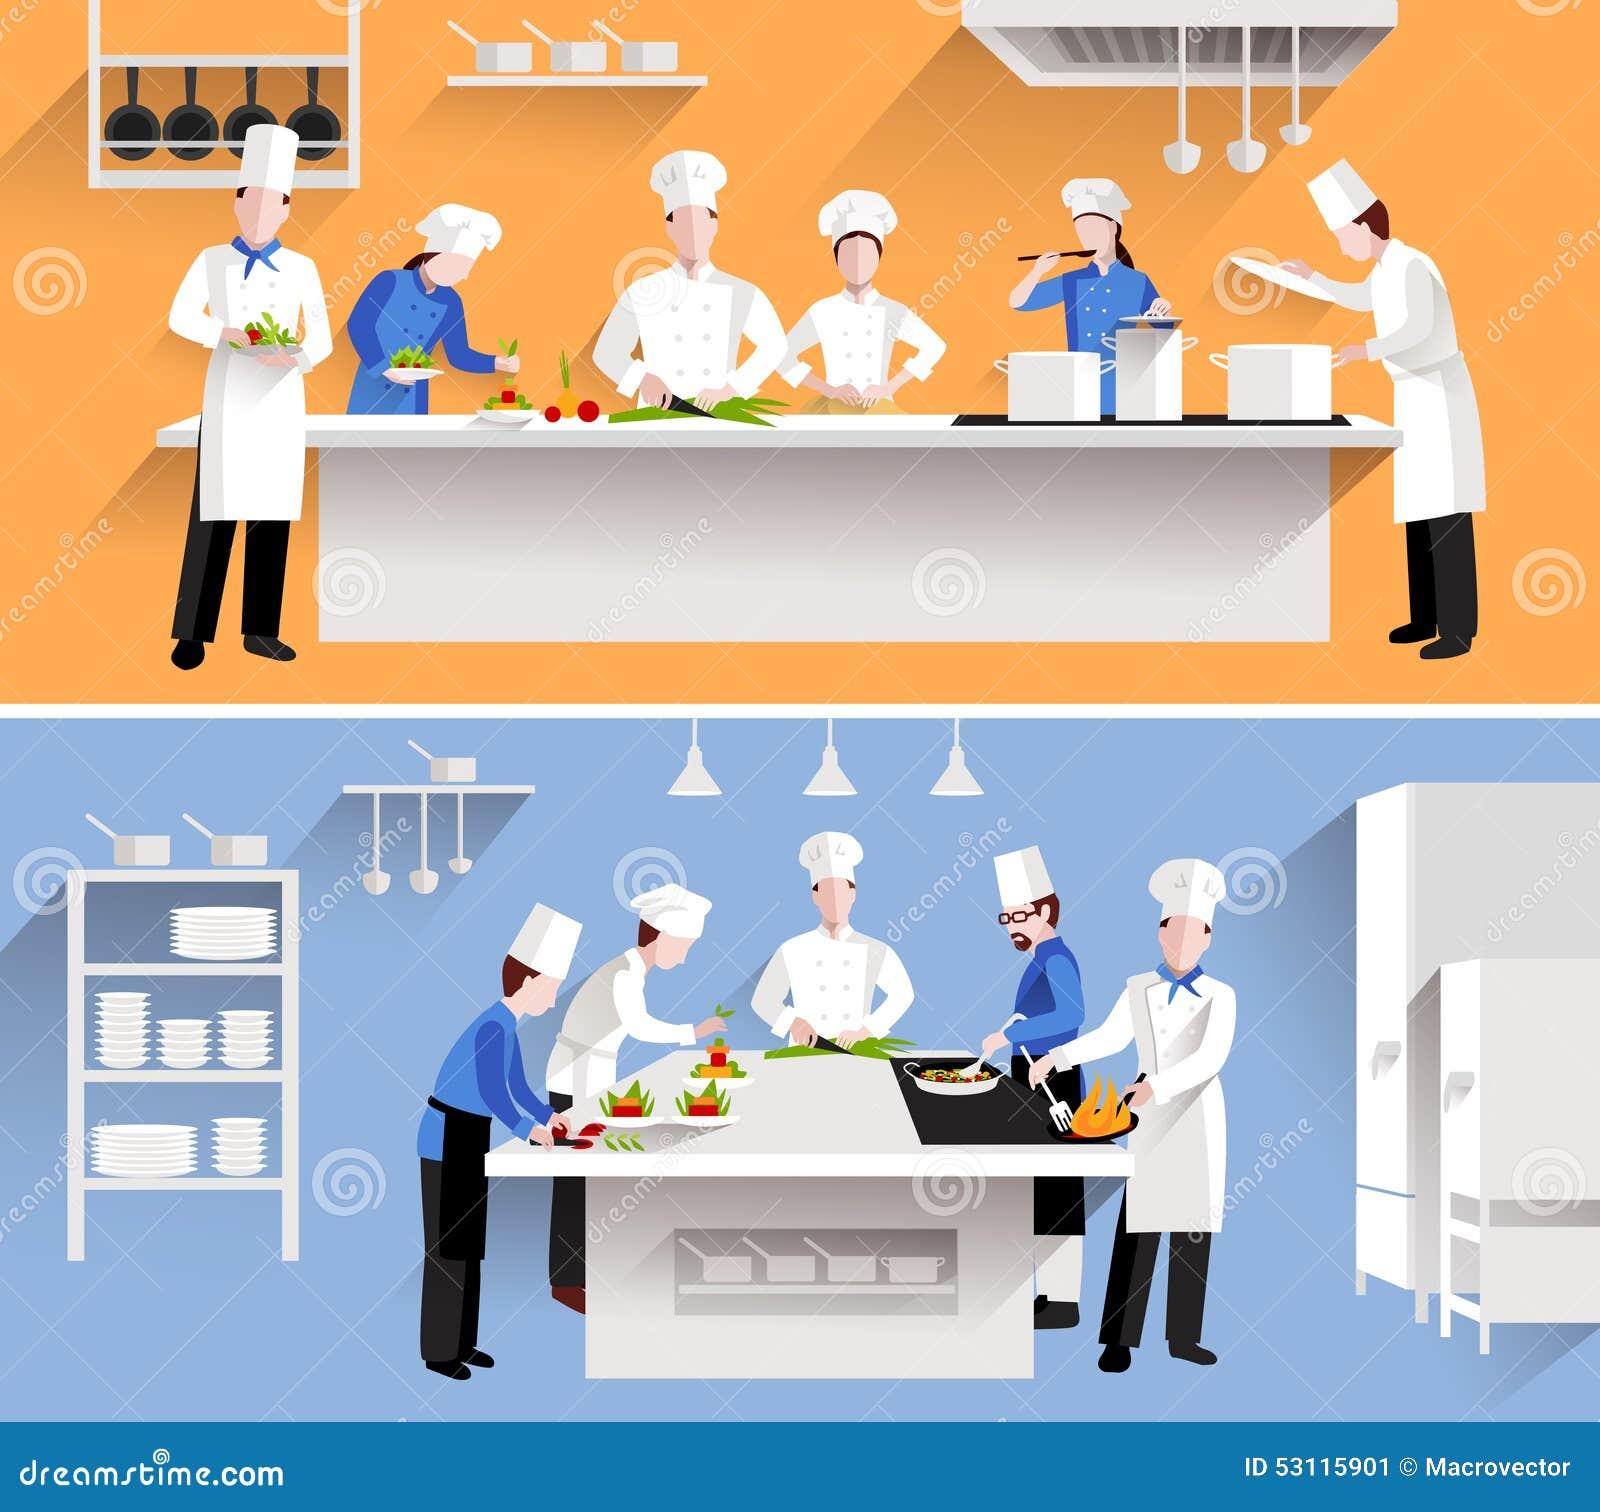 Restaurant Kitchen Illustration perfect restaurant kitchen illustration in and ideas